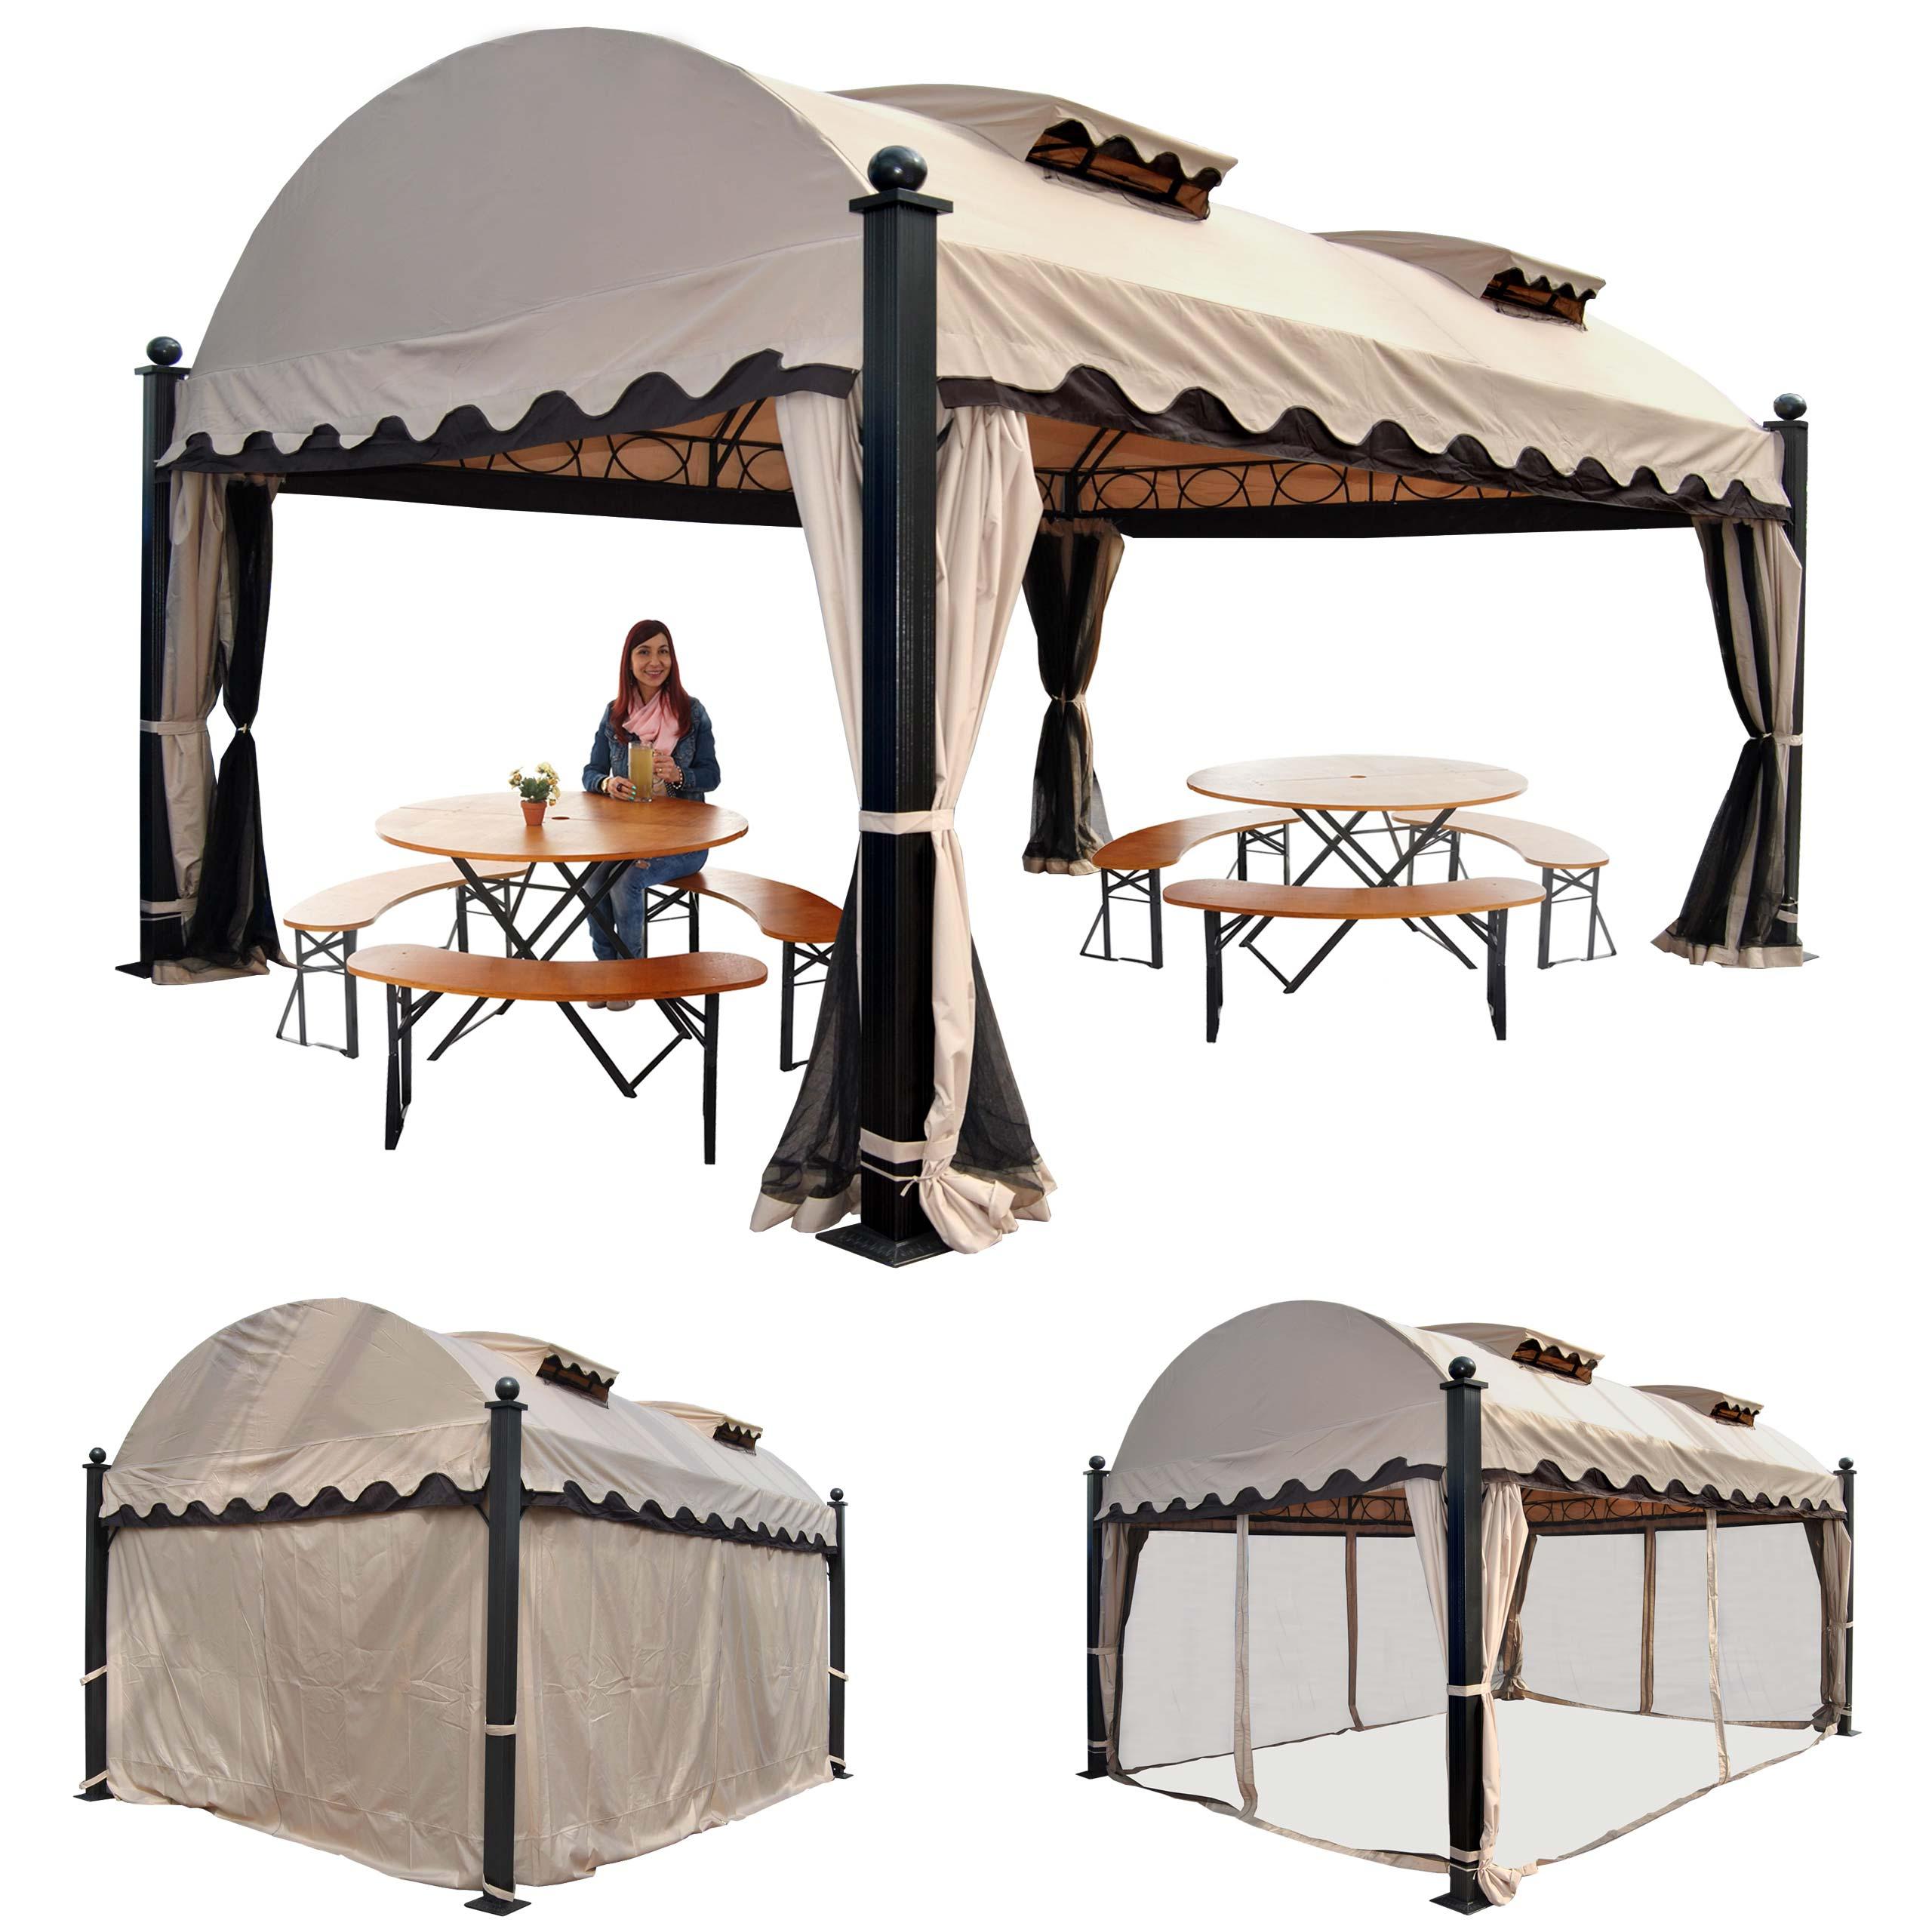 Pergola Daroca, Garten Pavillon, 10Cm Luxus-Alu-Gestell Mit Seitenwand +  Moskitonetz 4,5X3,5M intérieur Pergola 5X3